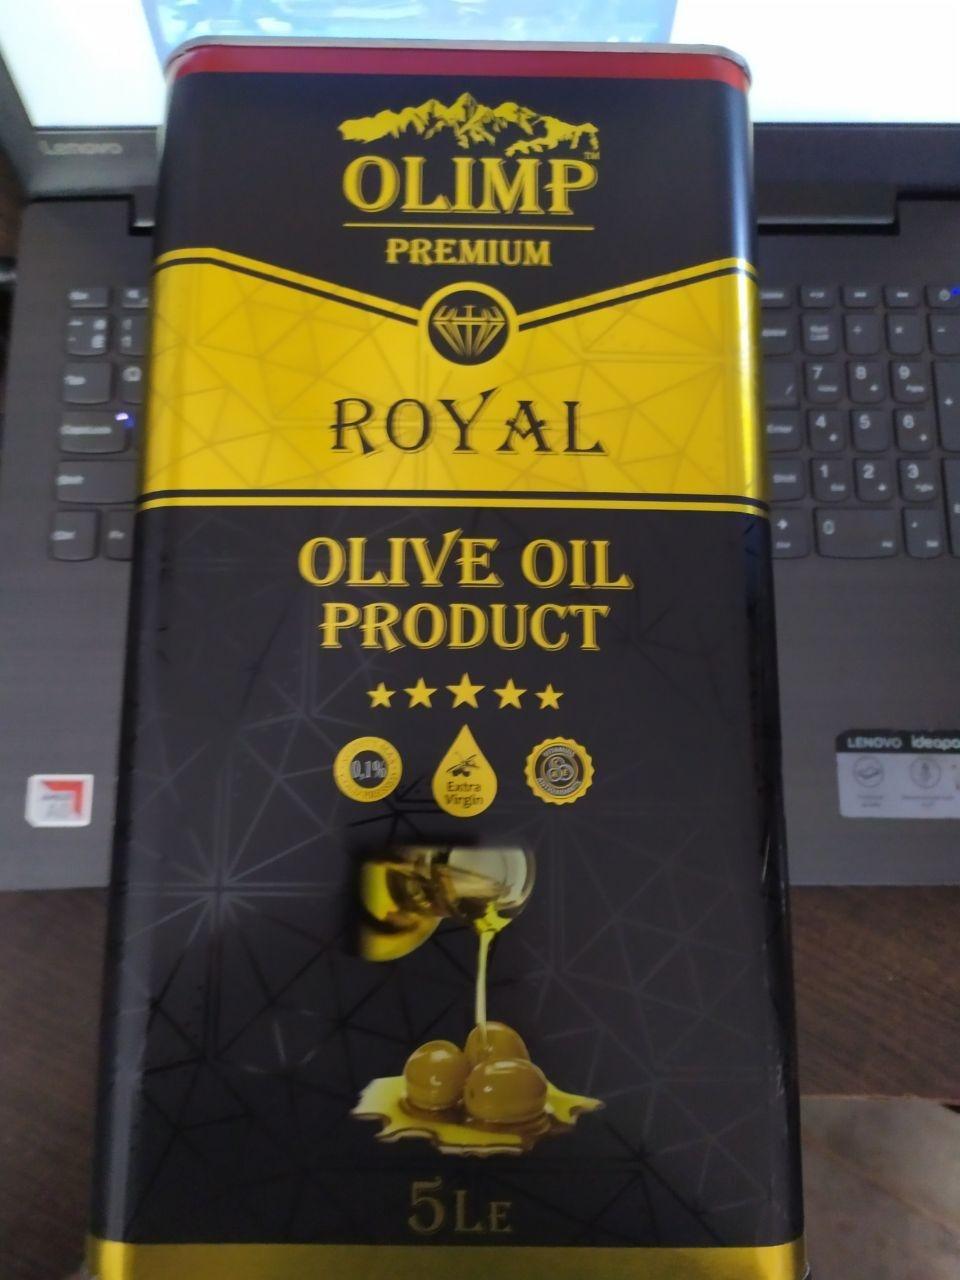 Оливковое масло Olimp Royal Extra Virgin